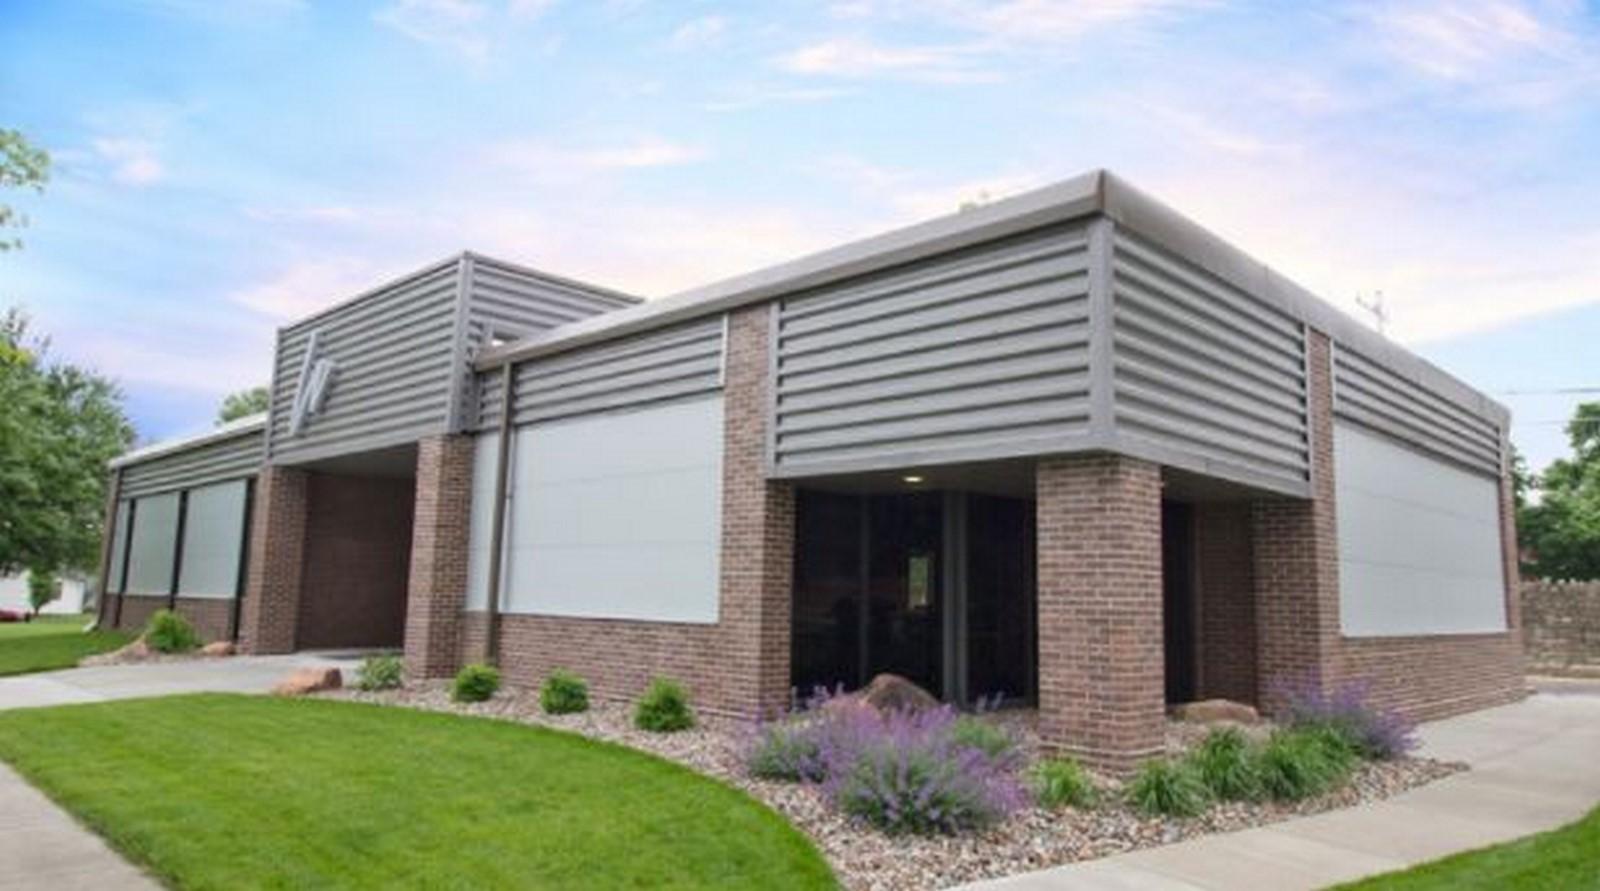 Architects in Omaha - Top 45 Architects in Omaha - Sheet4